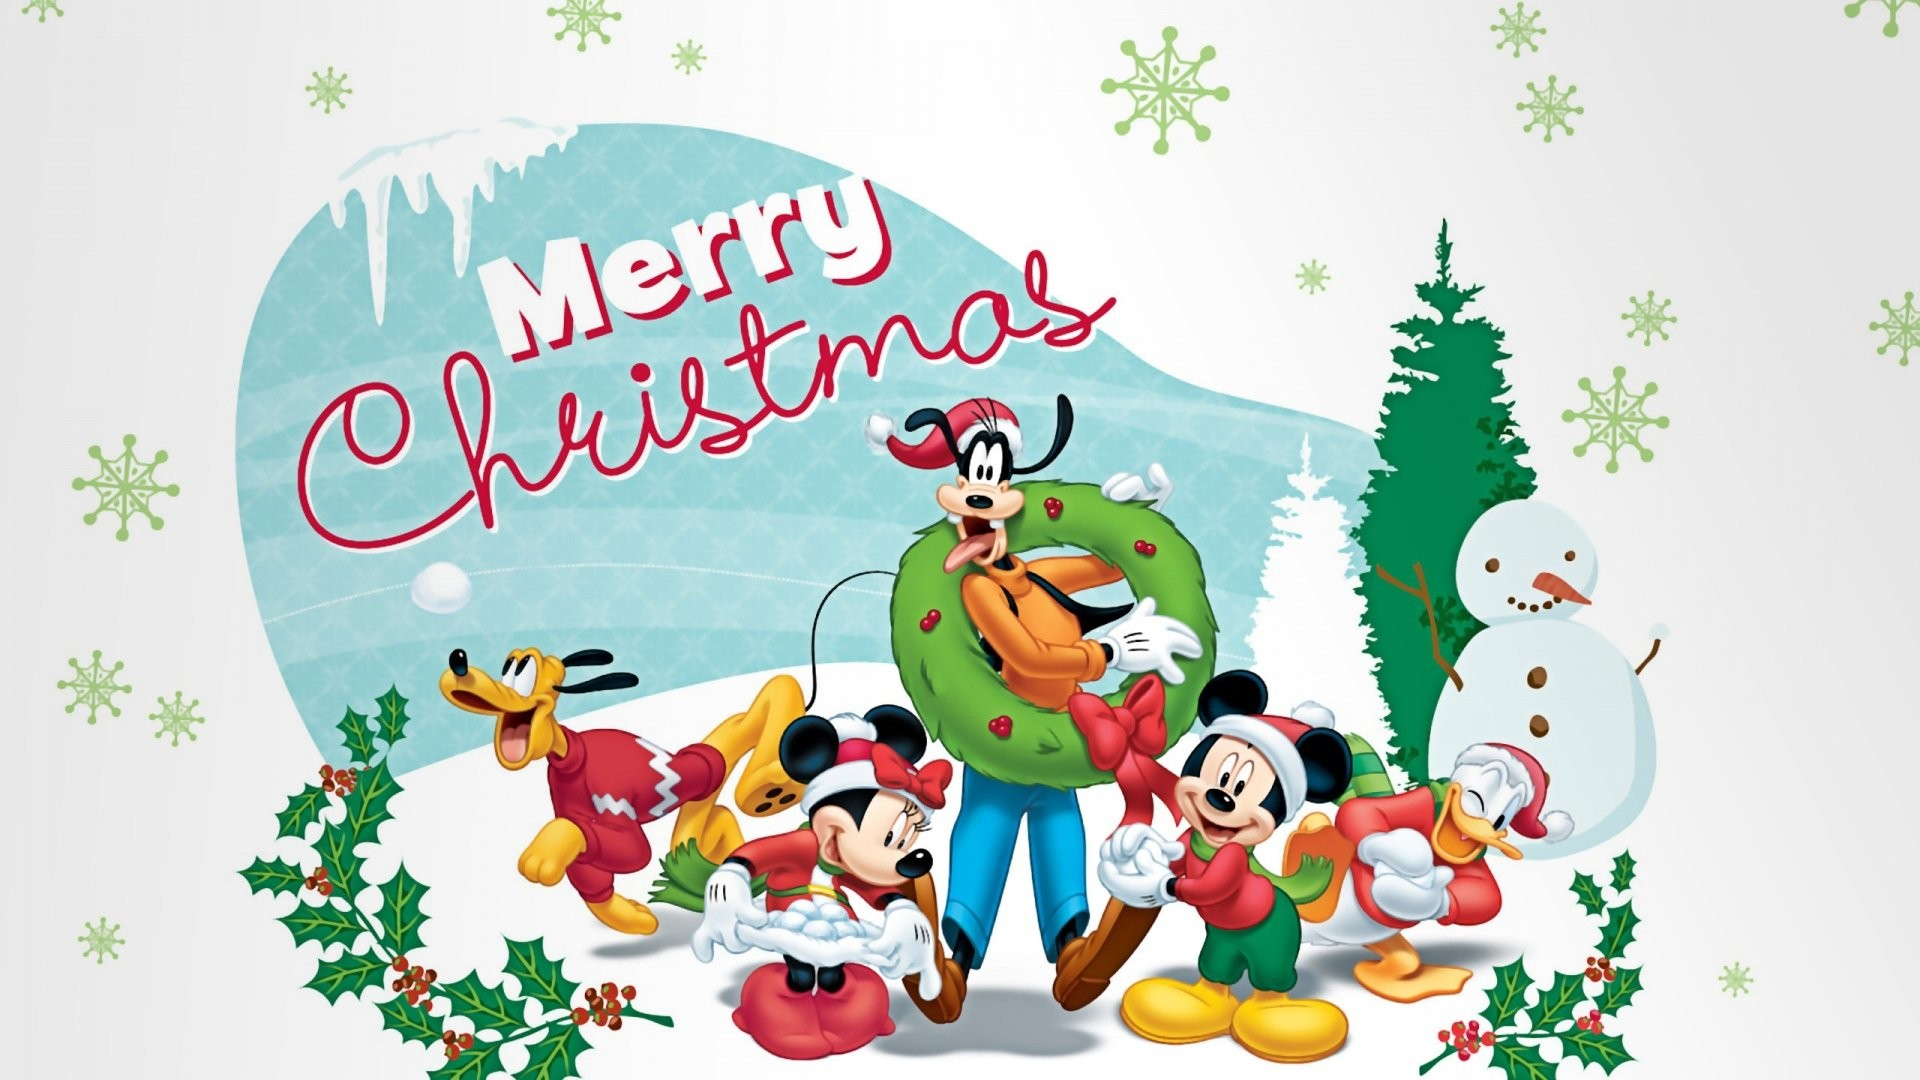 Res: 1920x1080, funny christmas wallpaper hd ; Christmas-desktop-scenes-winter-funny- wallpapers